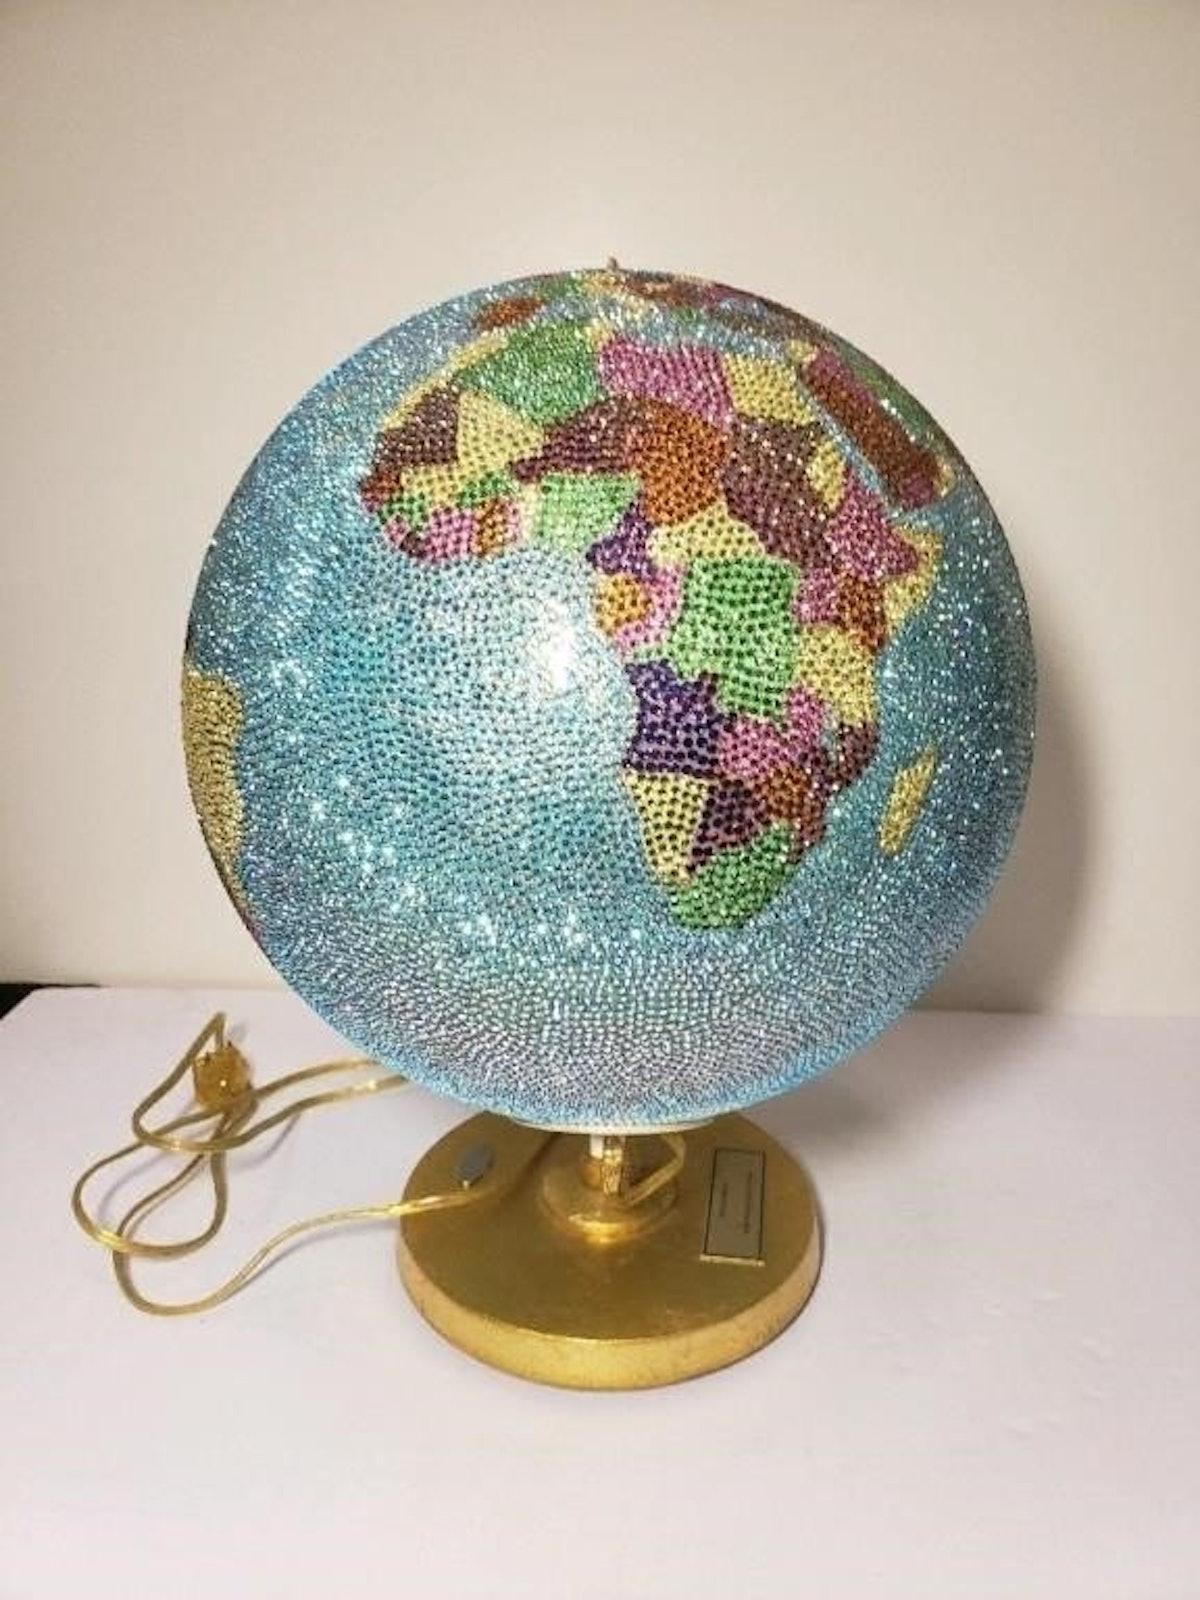 Bedazzled globe.